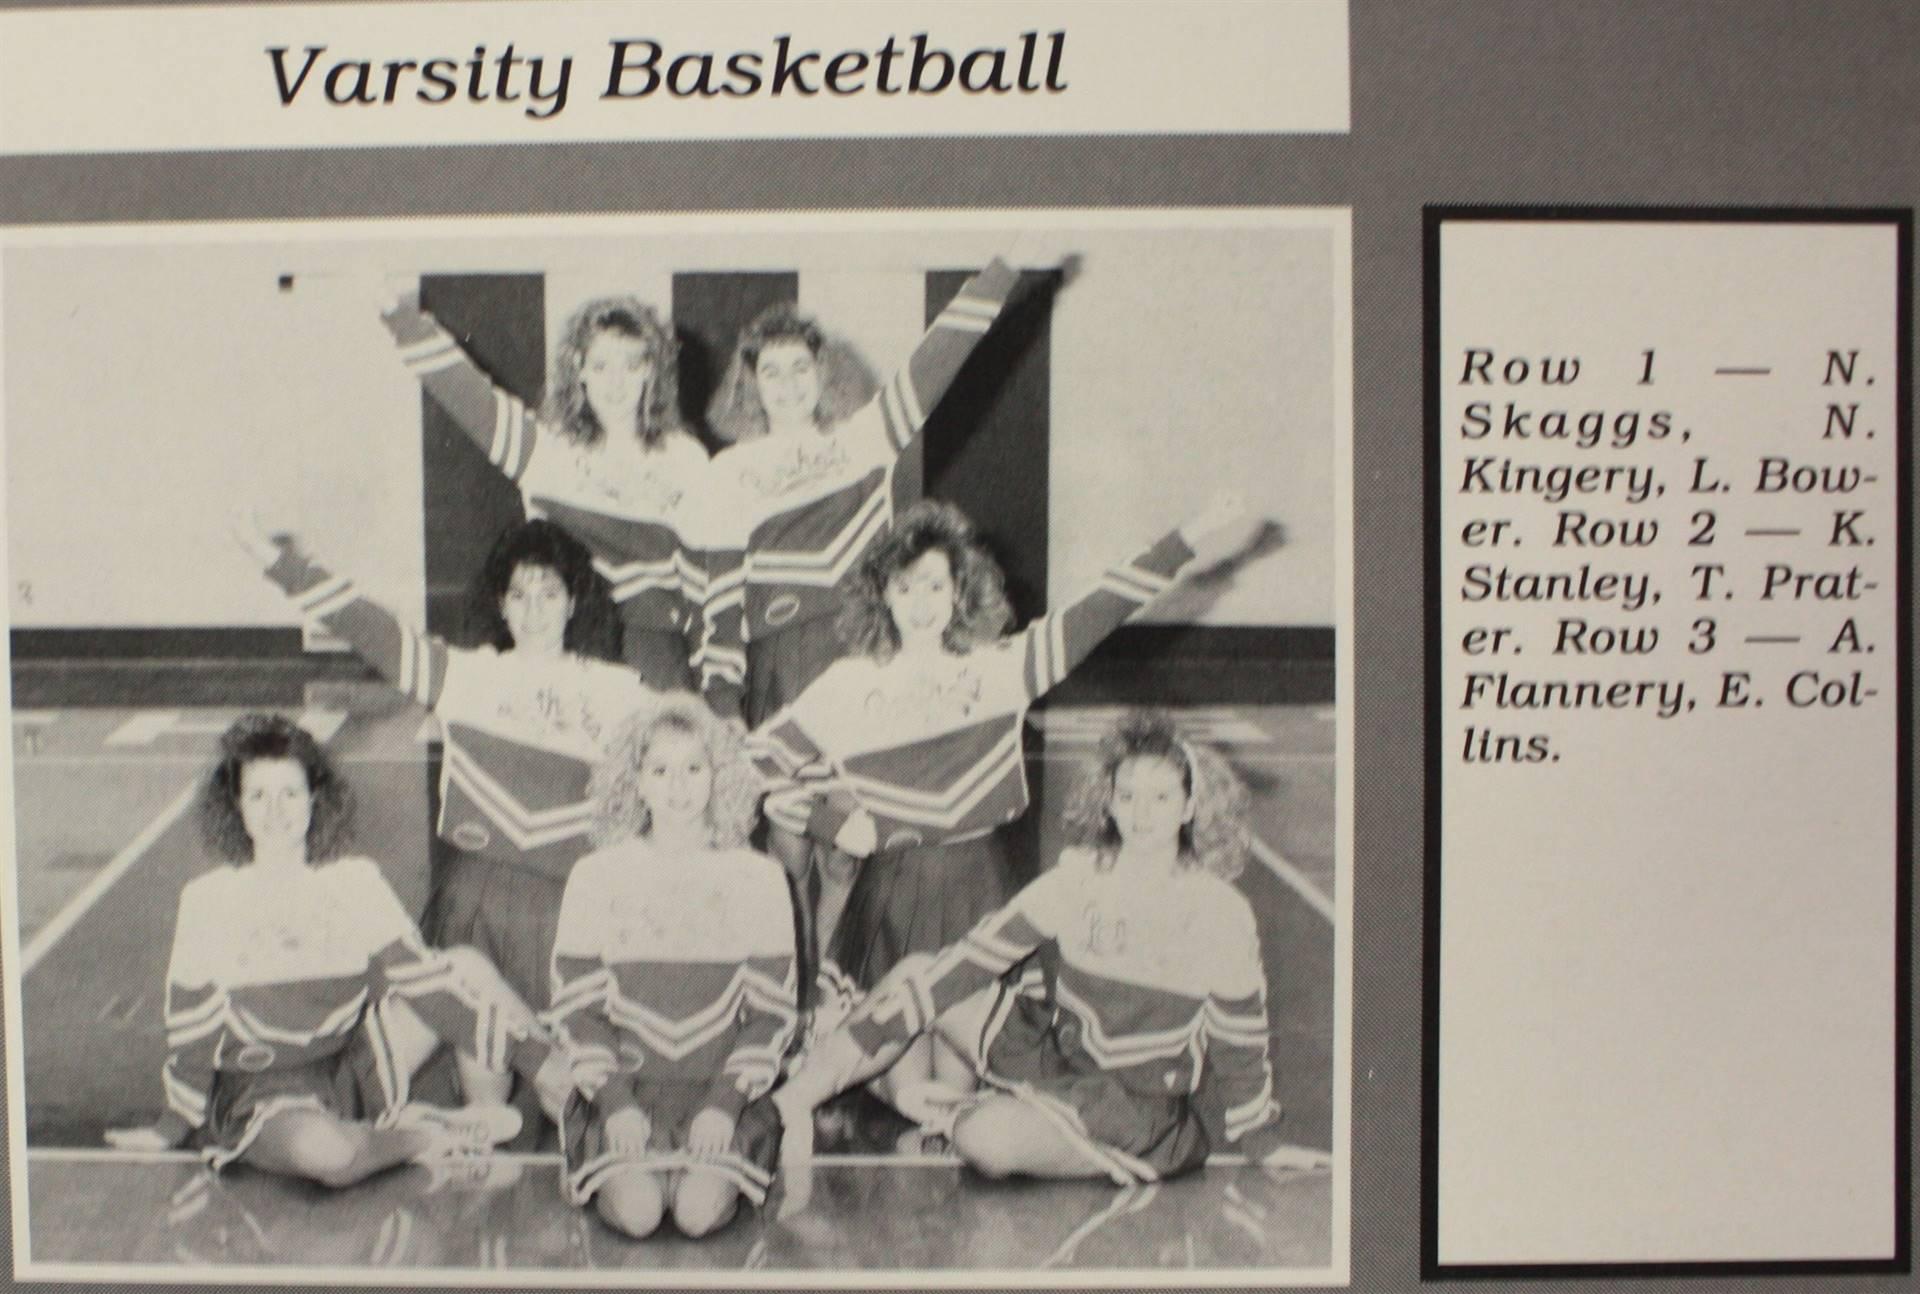 1991 Varsity Basketball Cheerleaders